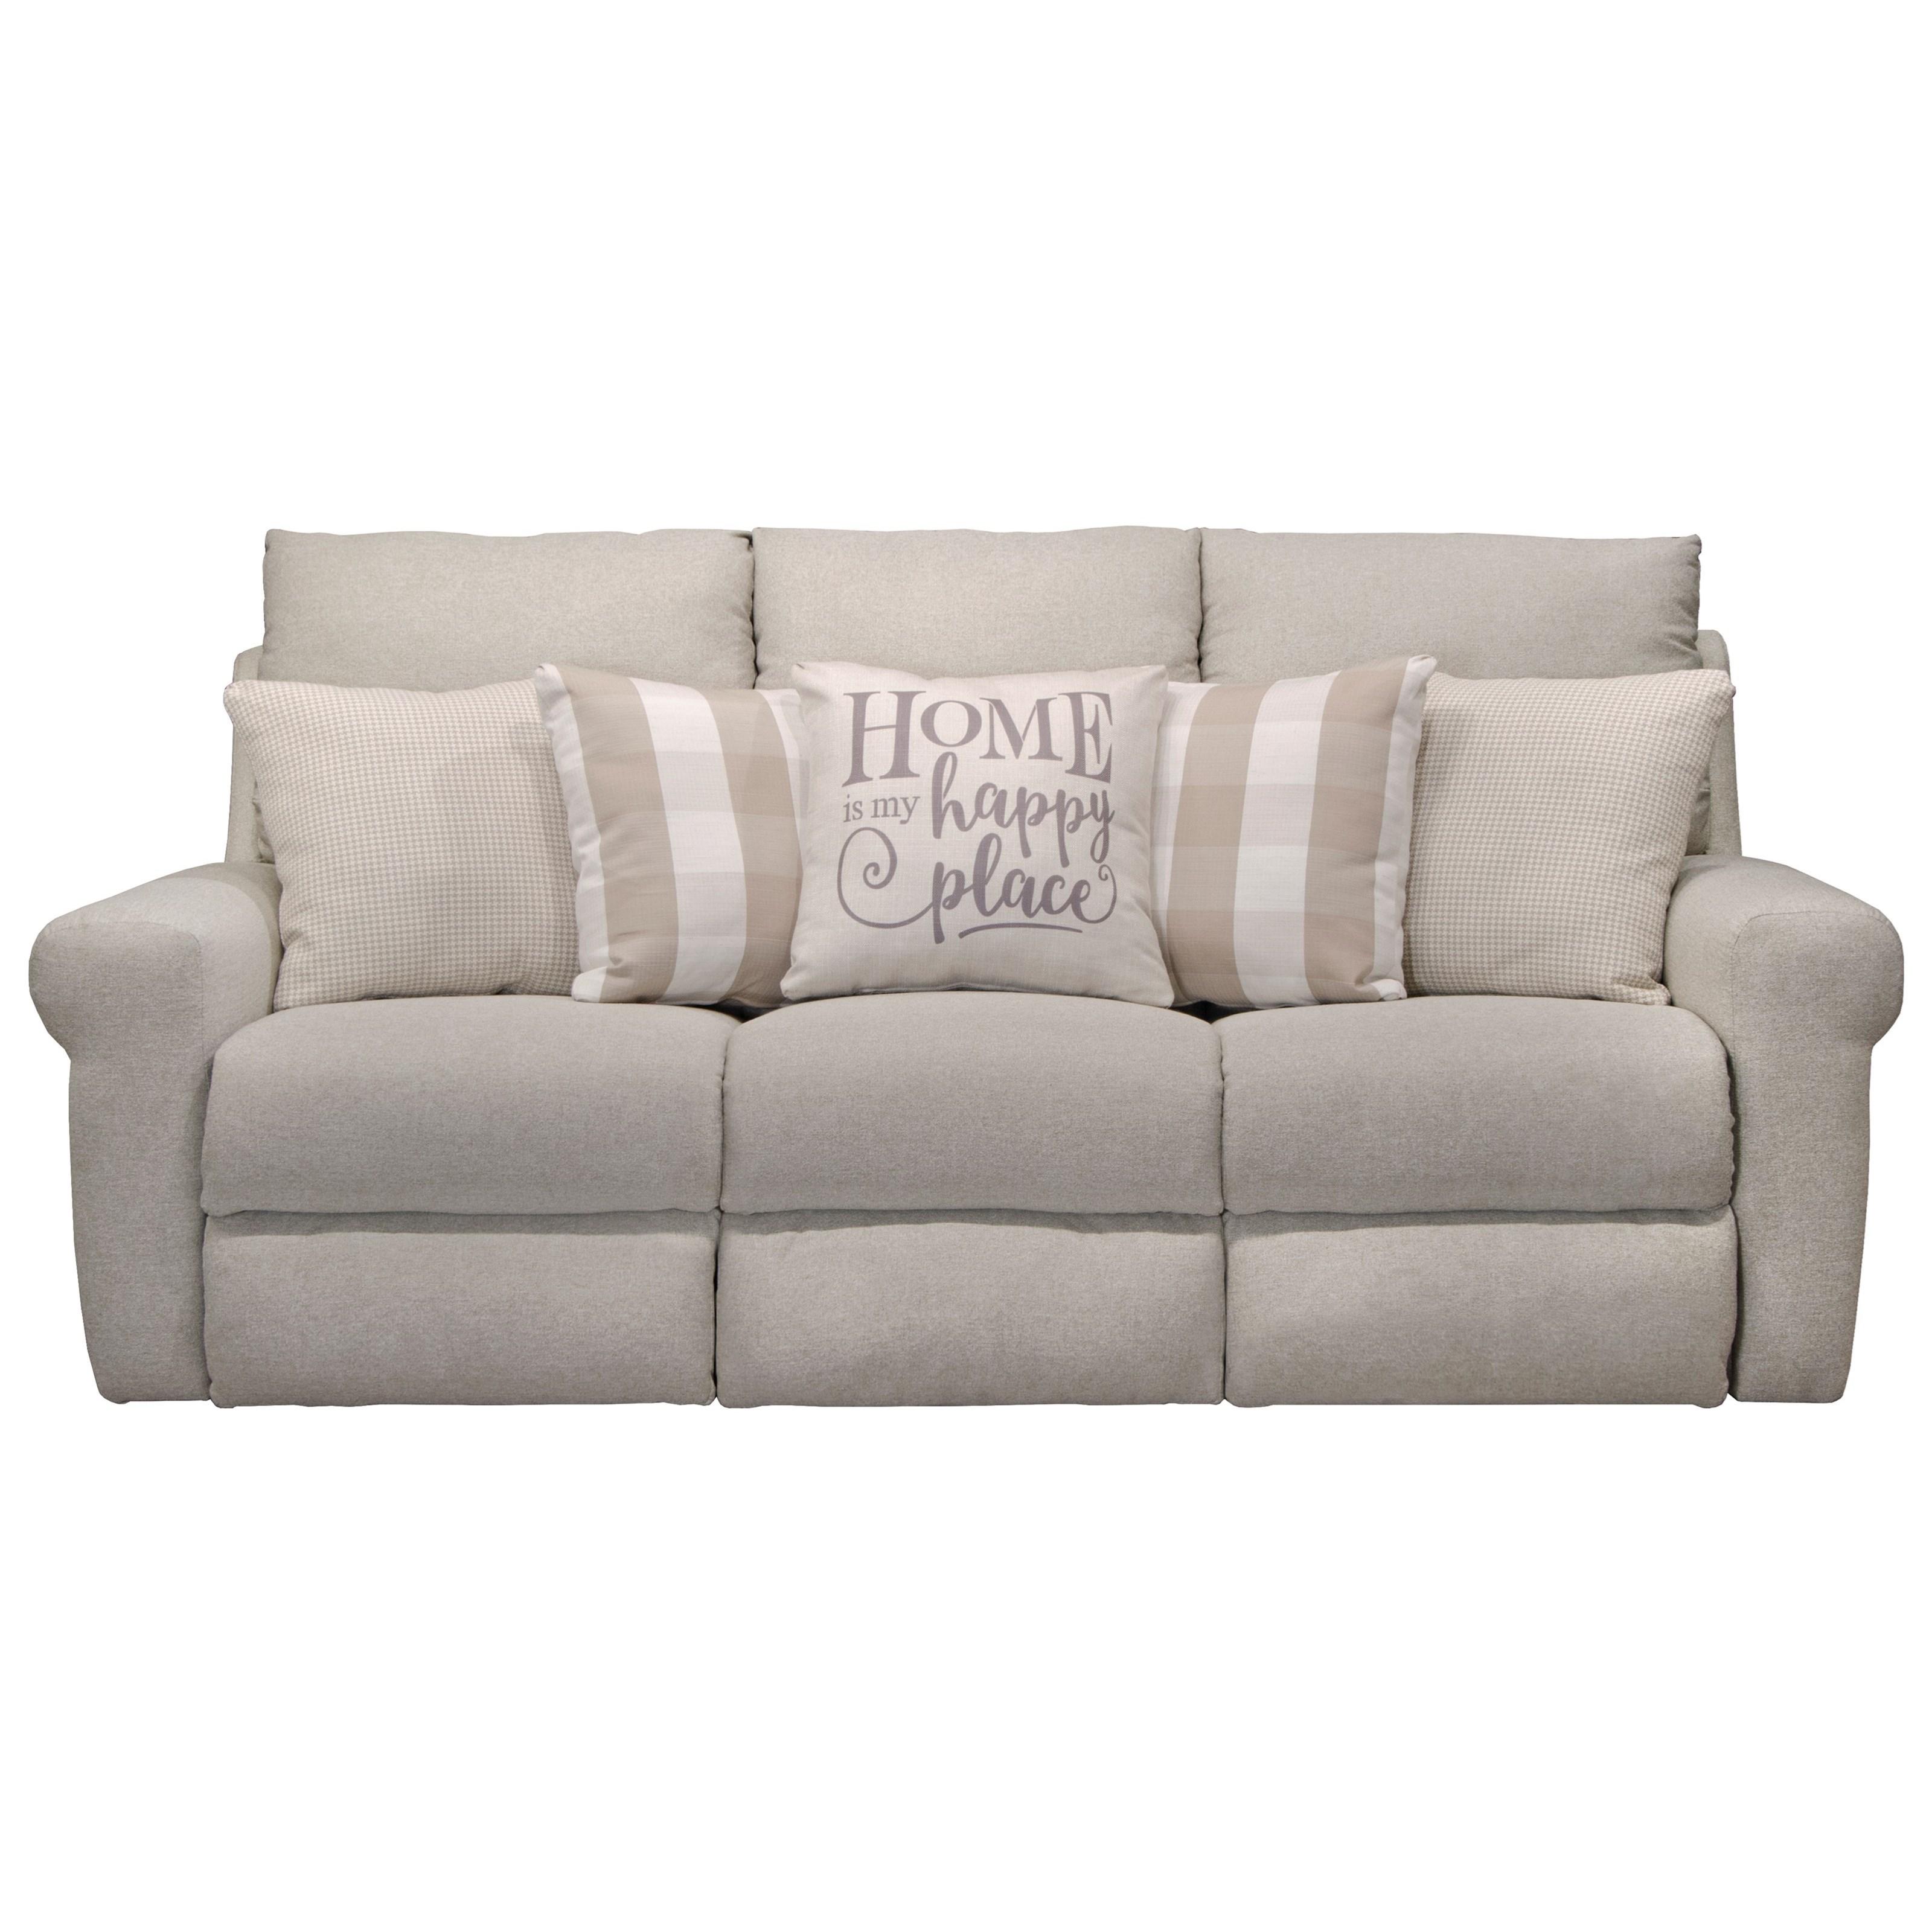 Westport Lay Flat Reclining Sofa by Catnapper at Zak's Home